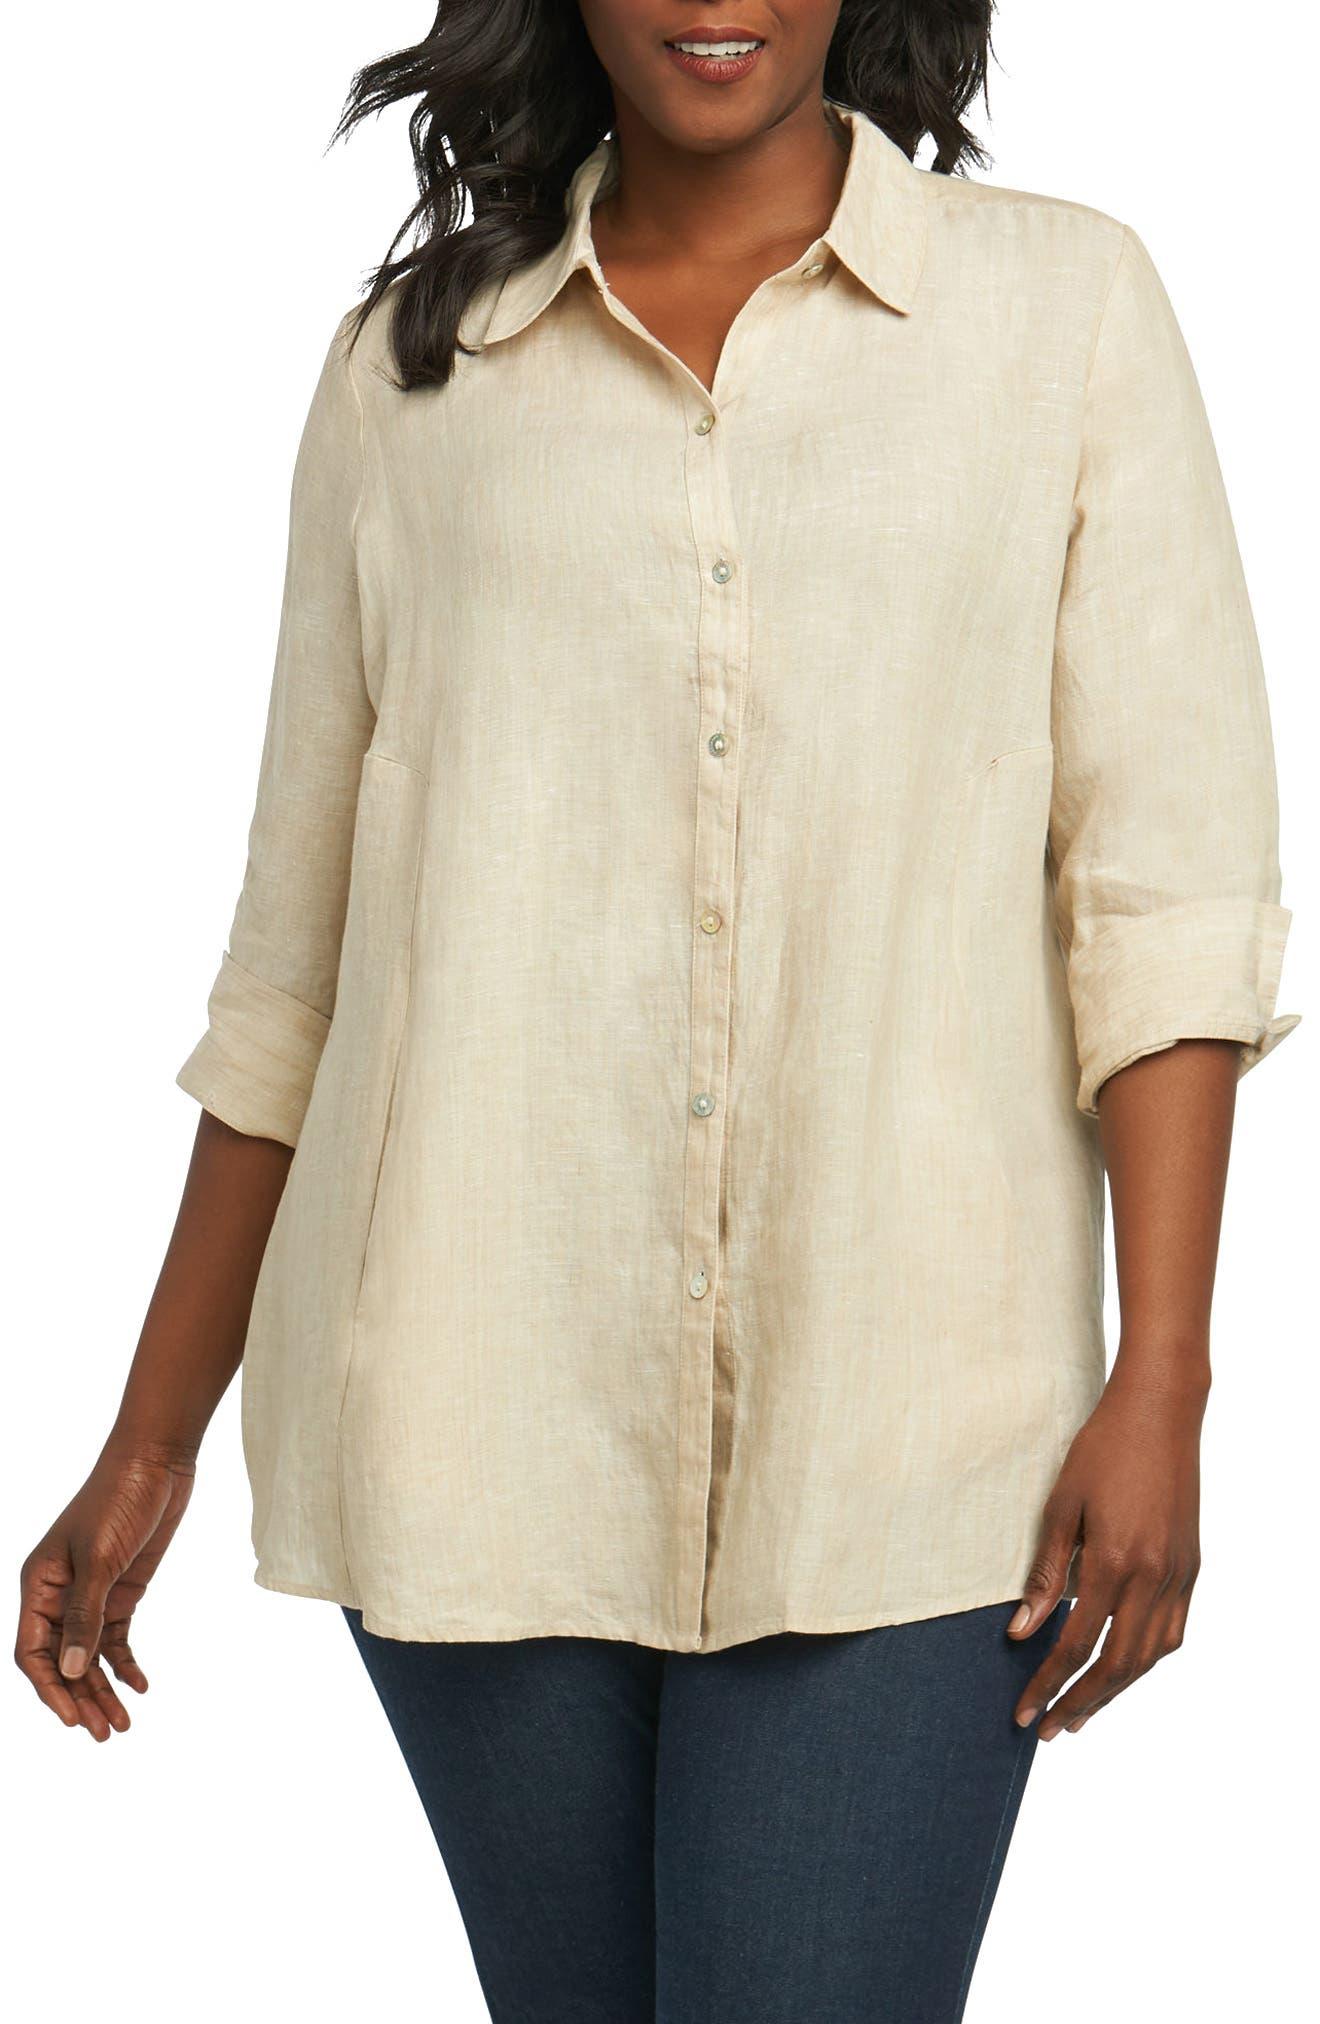 Cici Linen Chambray Shirt,                         Main,                         color, 275